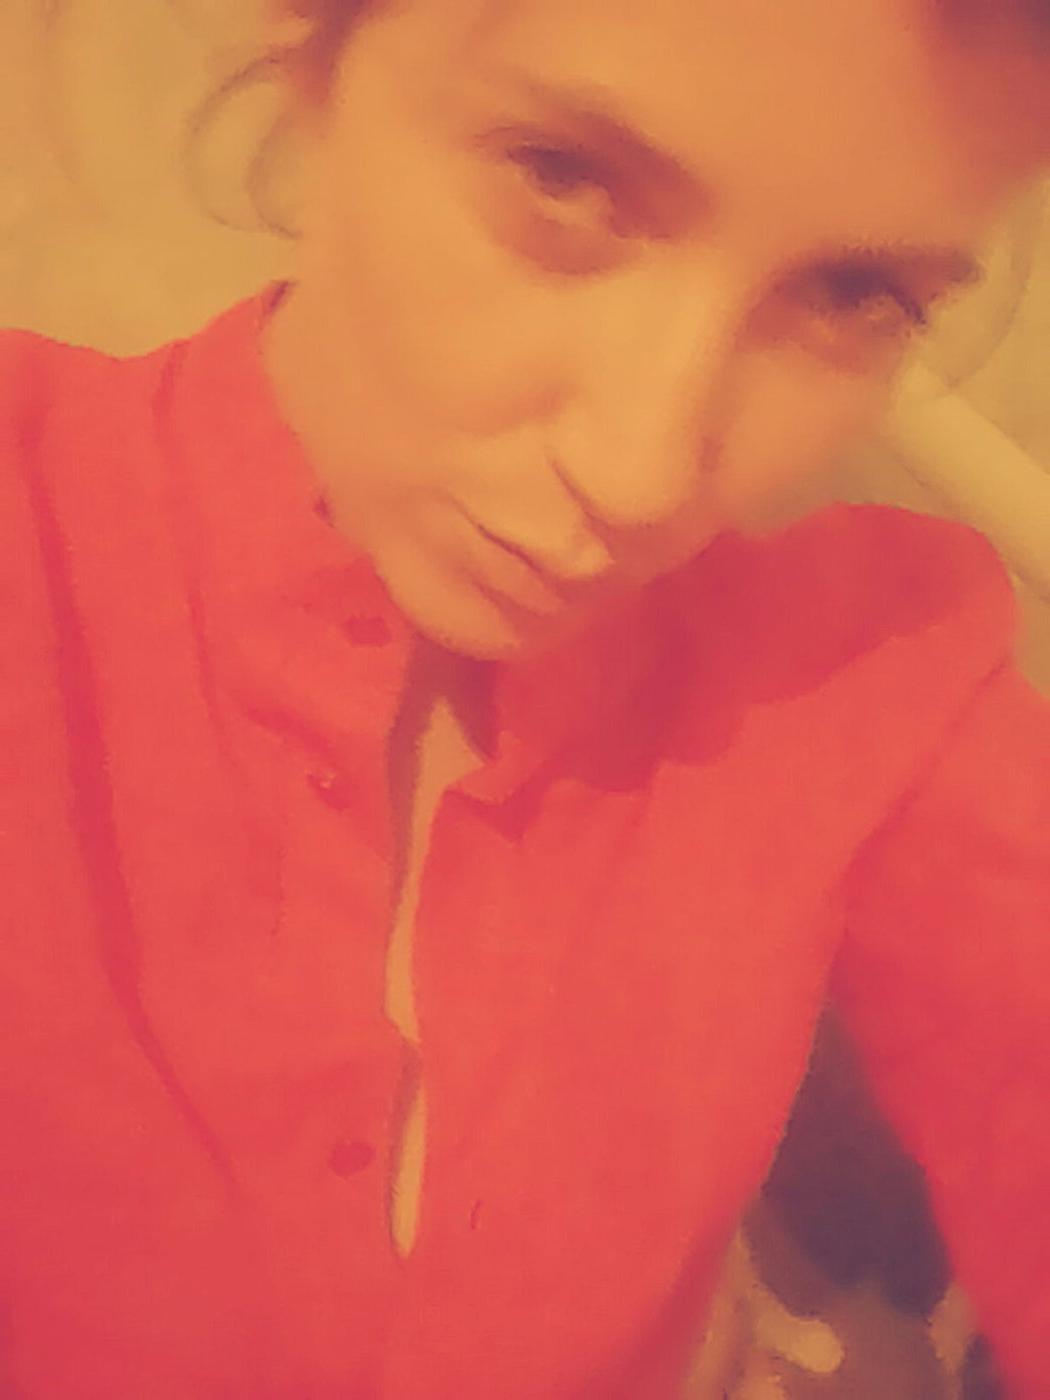 Проститутка Ирен, 21 год, метро Авиамоторная